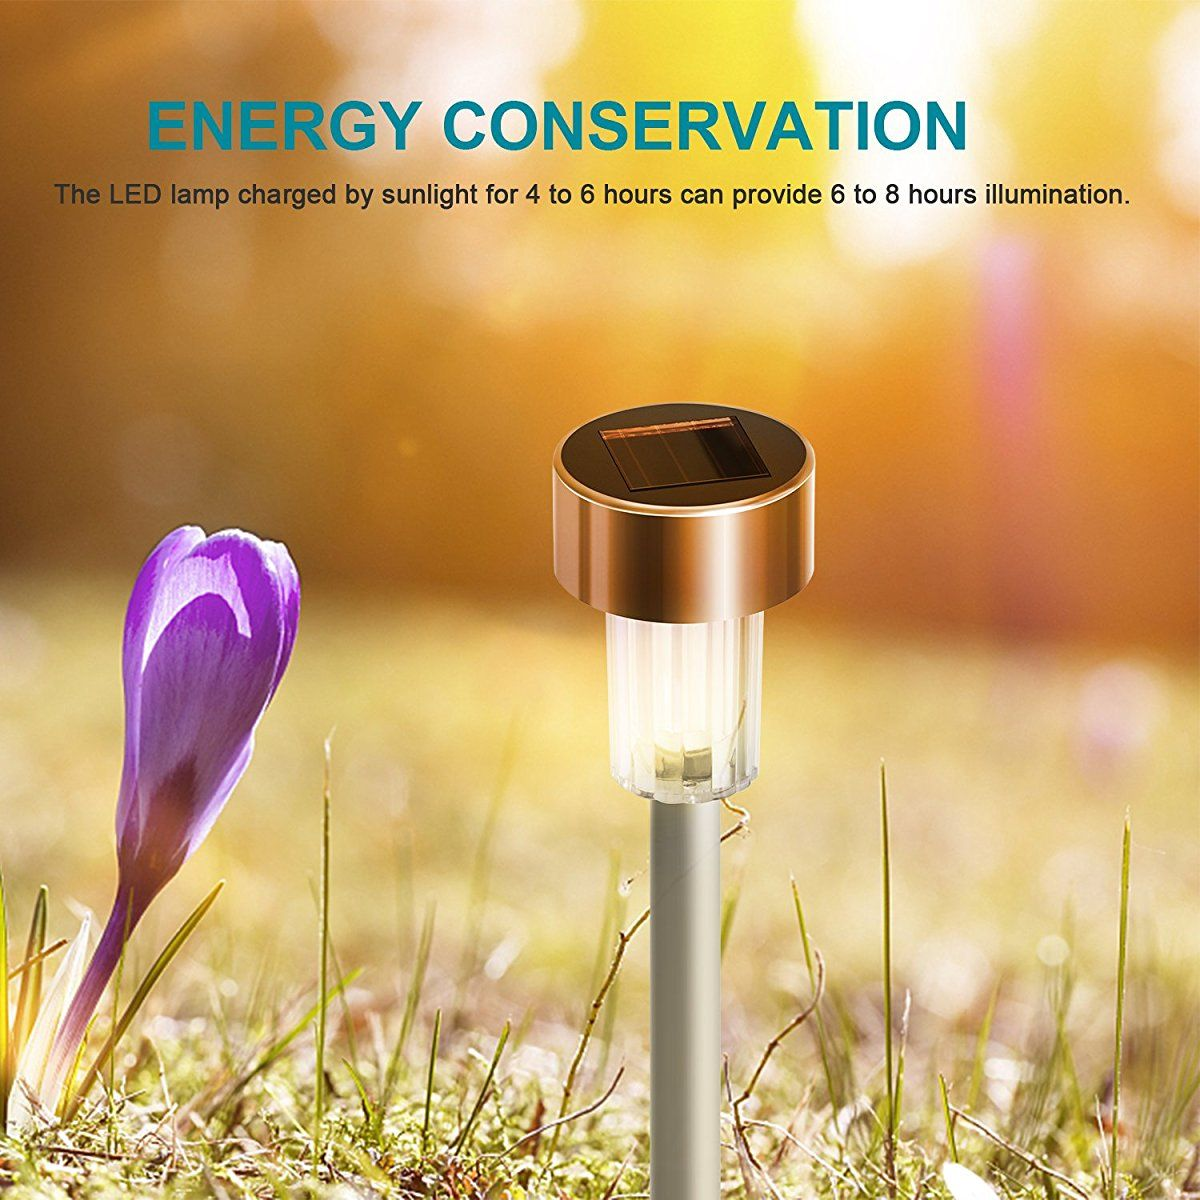 LOT Solar LED Pathway Outdoor Stainless Steel LED Solar Step Light Home Garden M